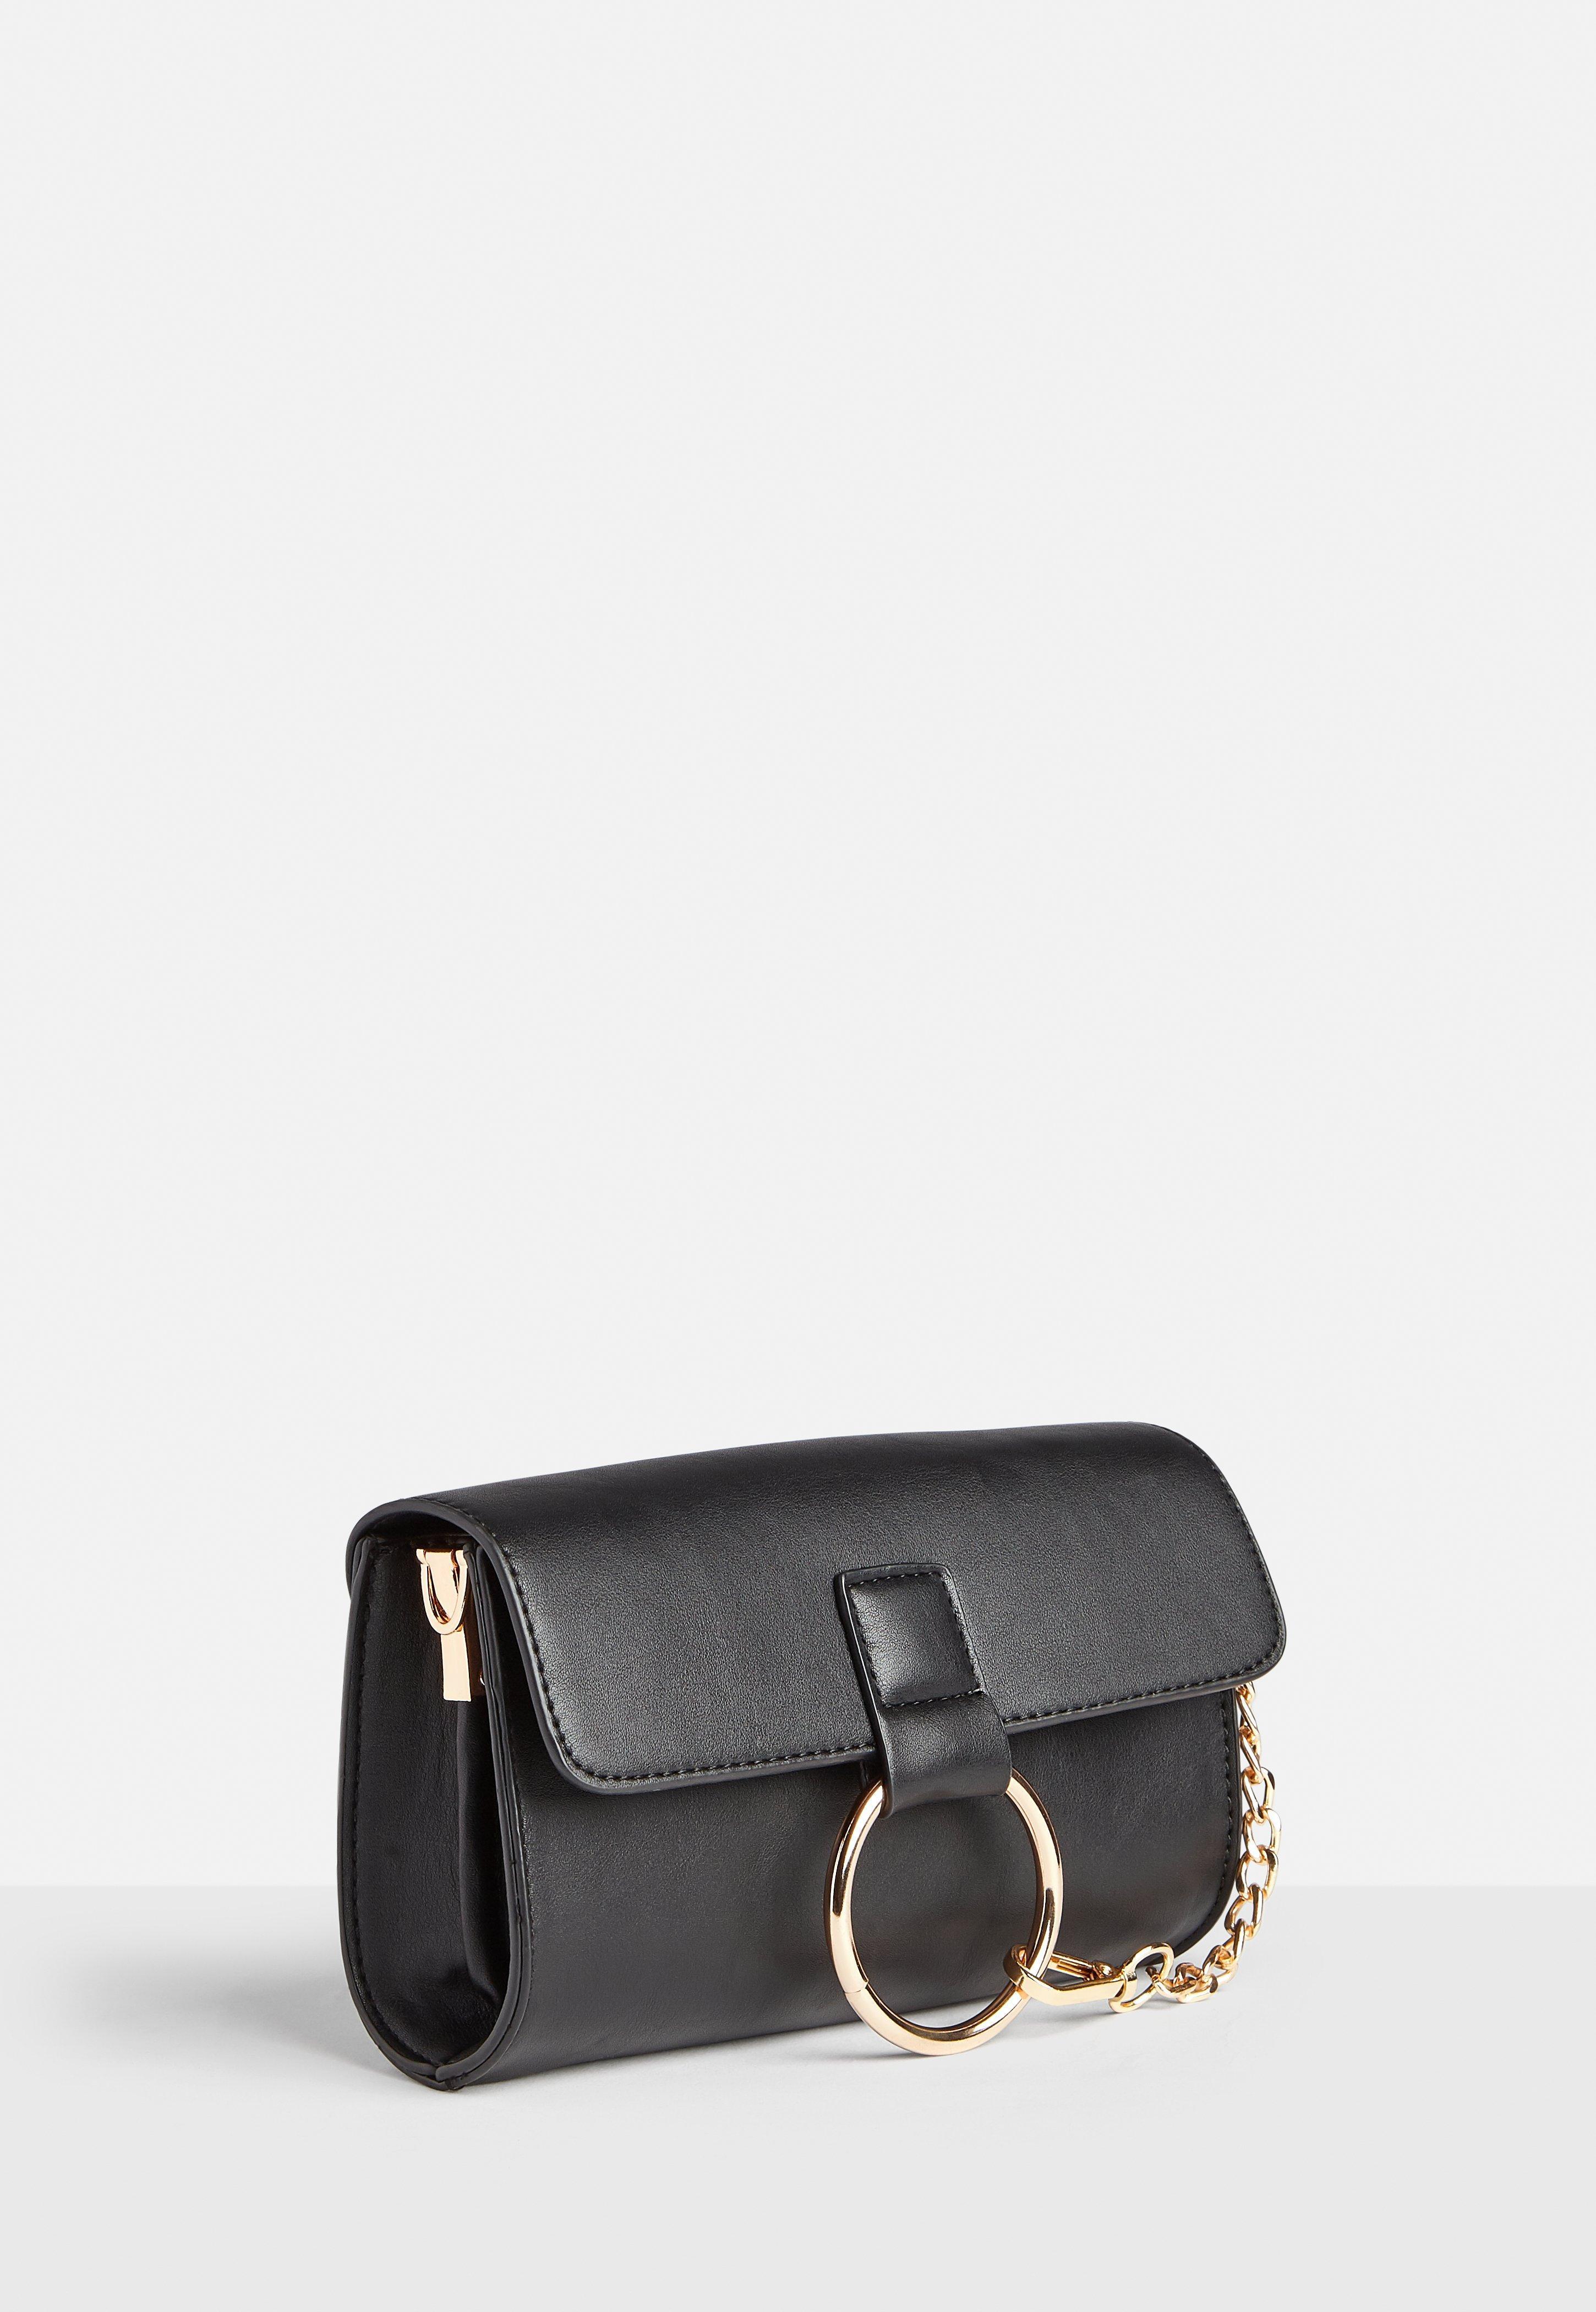 ae7e4160ff248 Missguided Black Ring Detail Clutch Bag in Black - Lyst